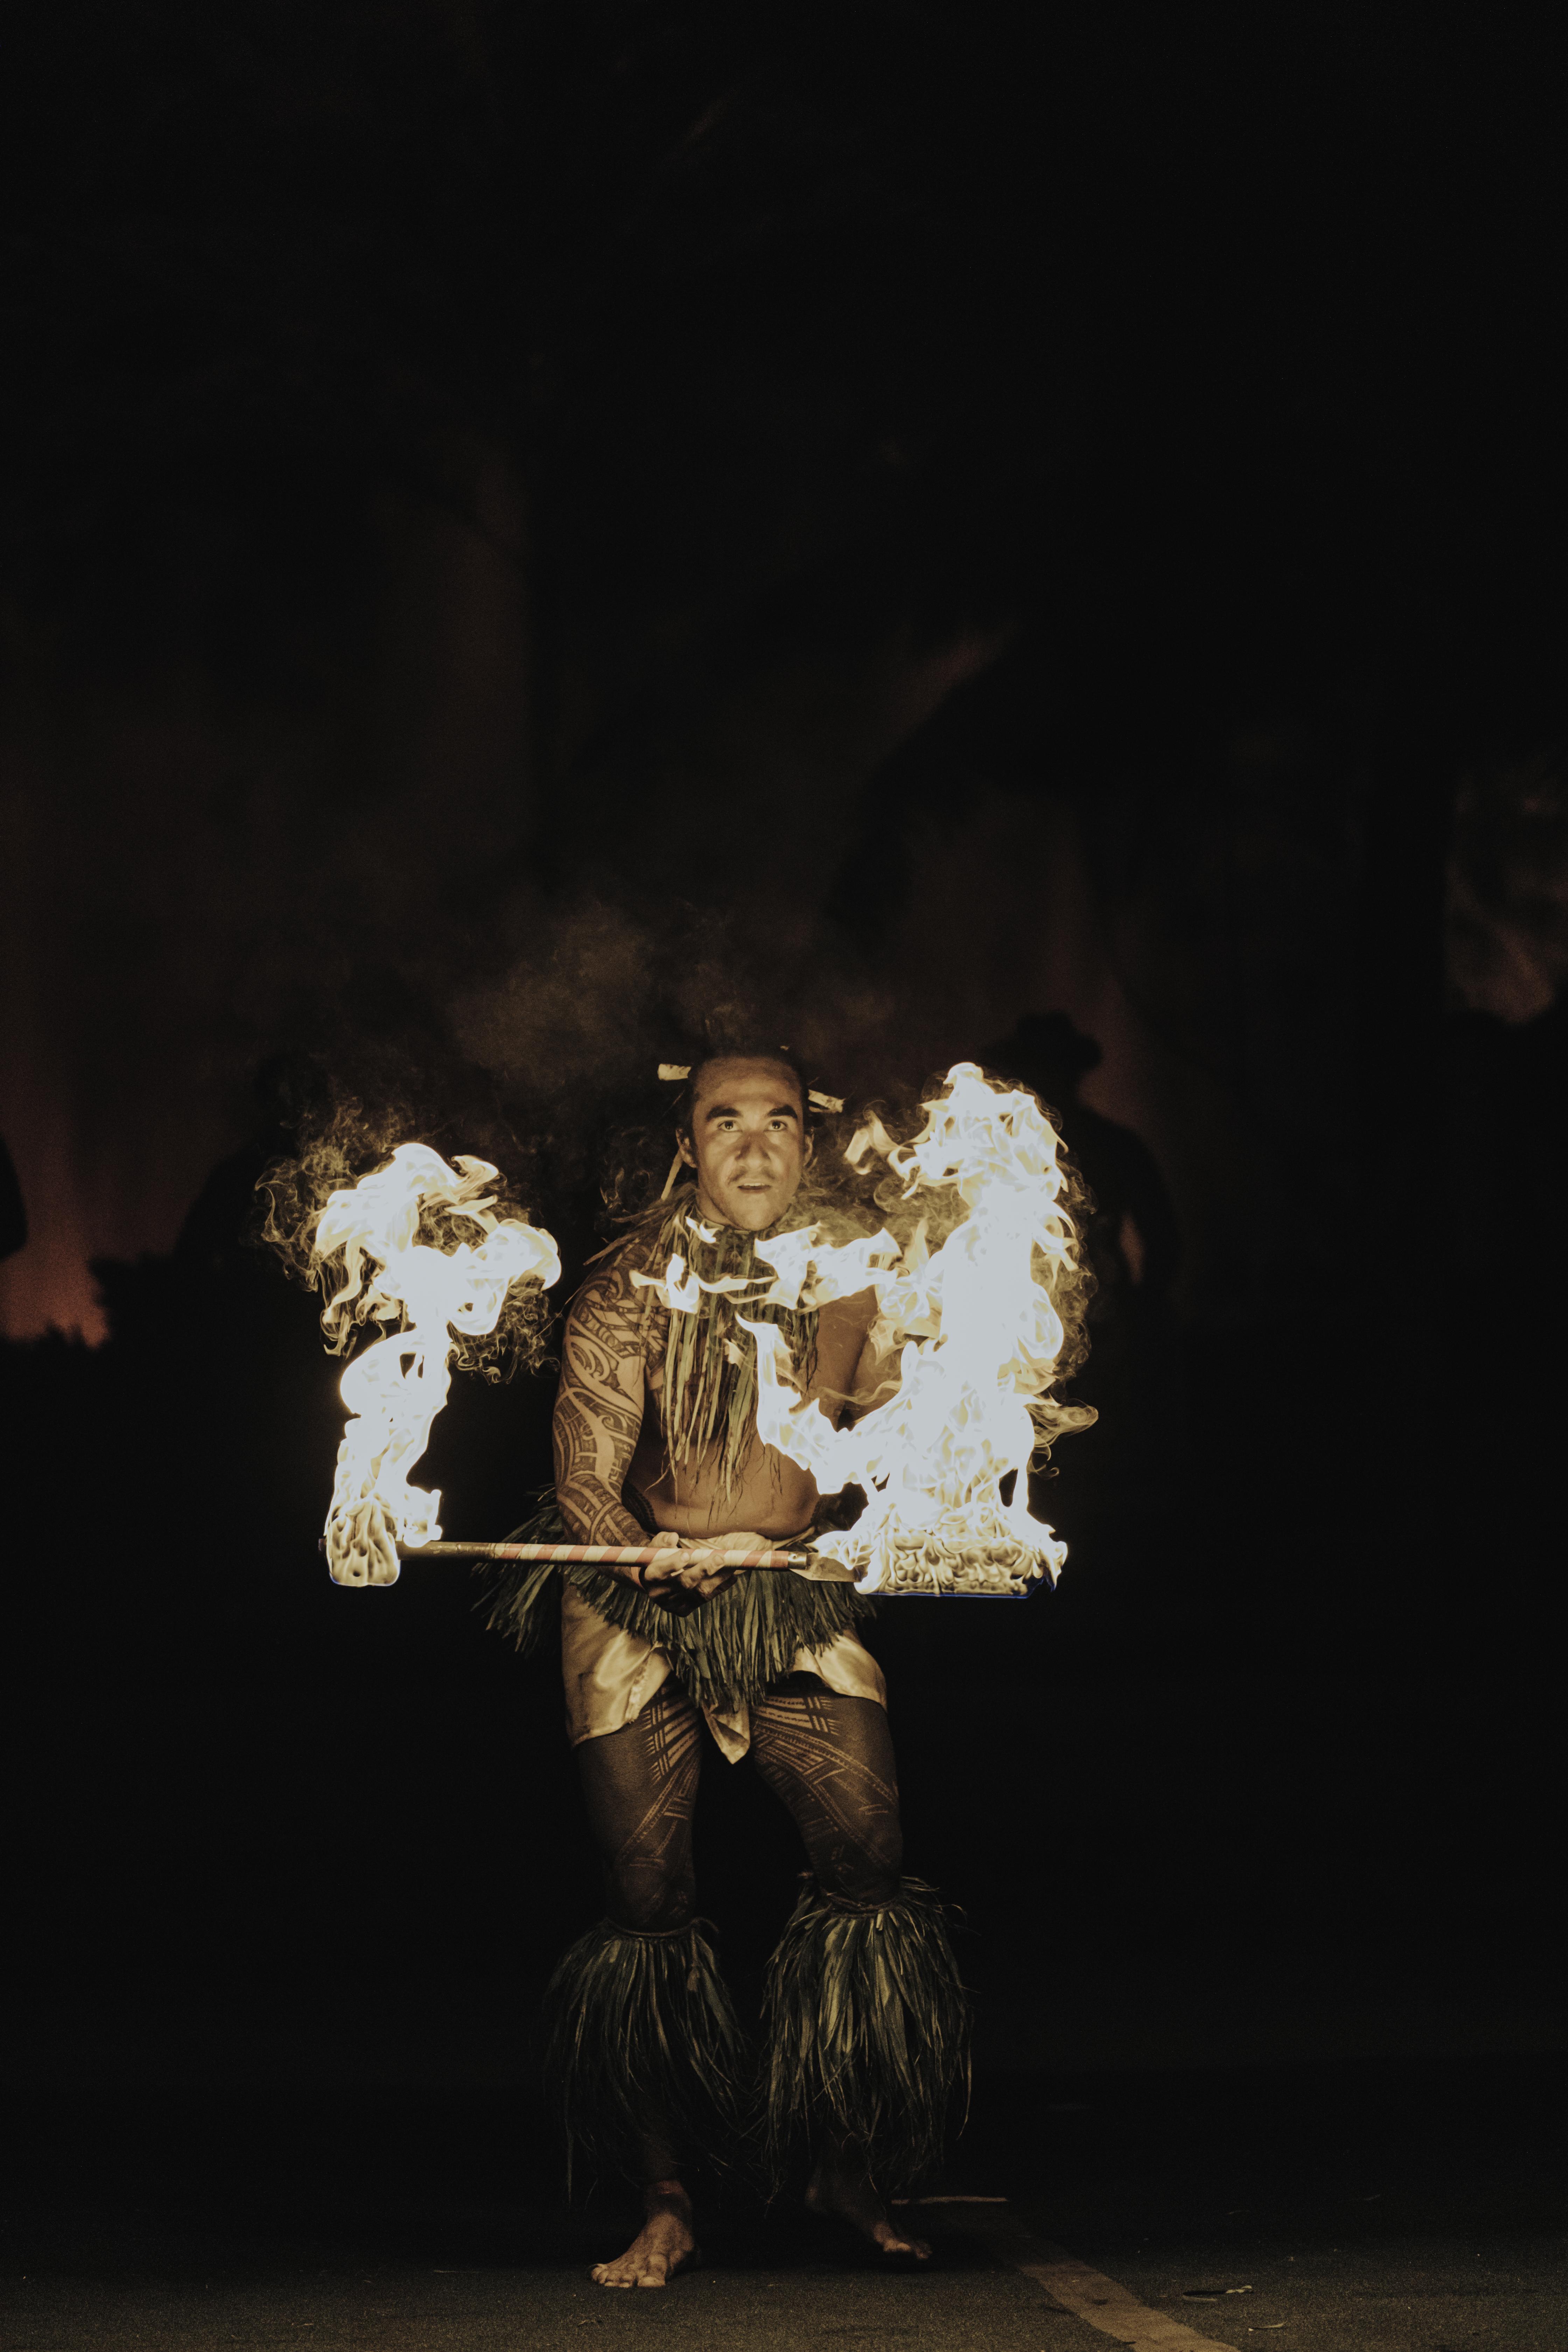 Kepanipaa Damaso performs Fireknife dance